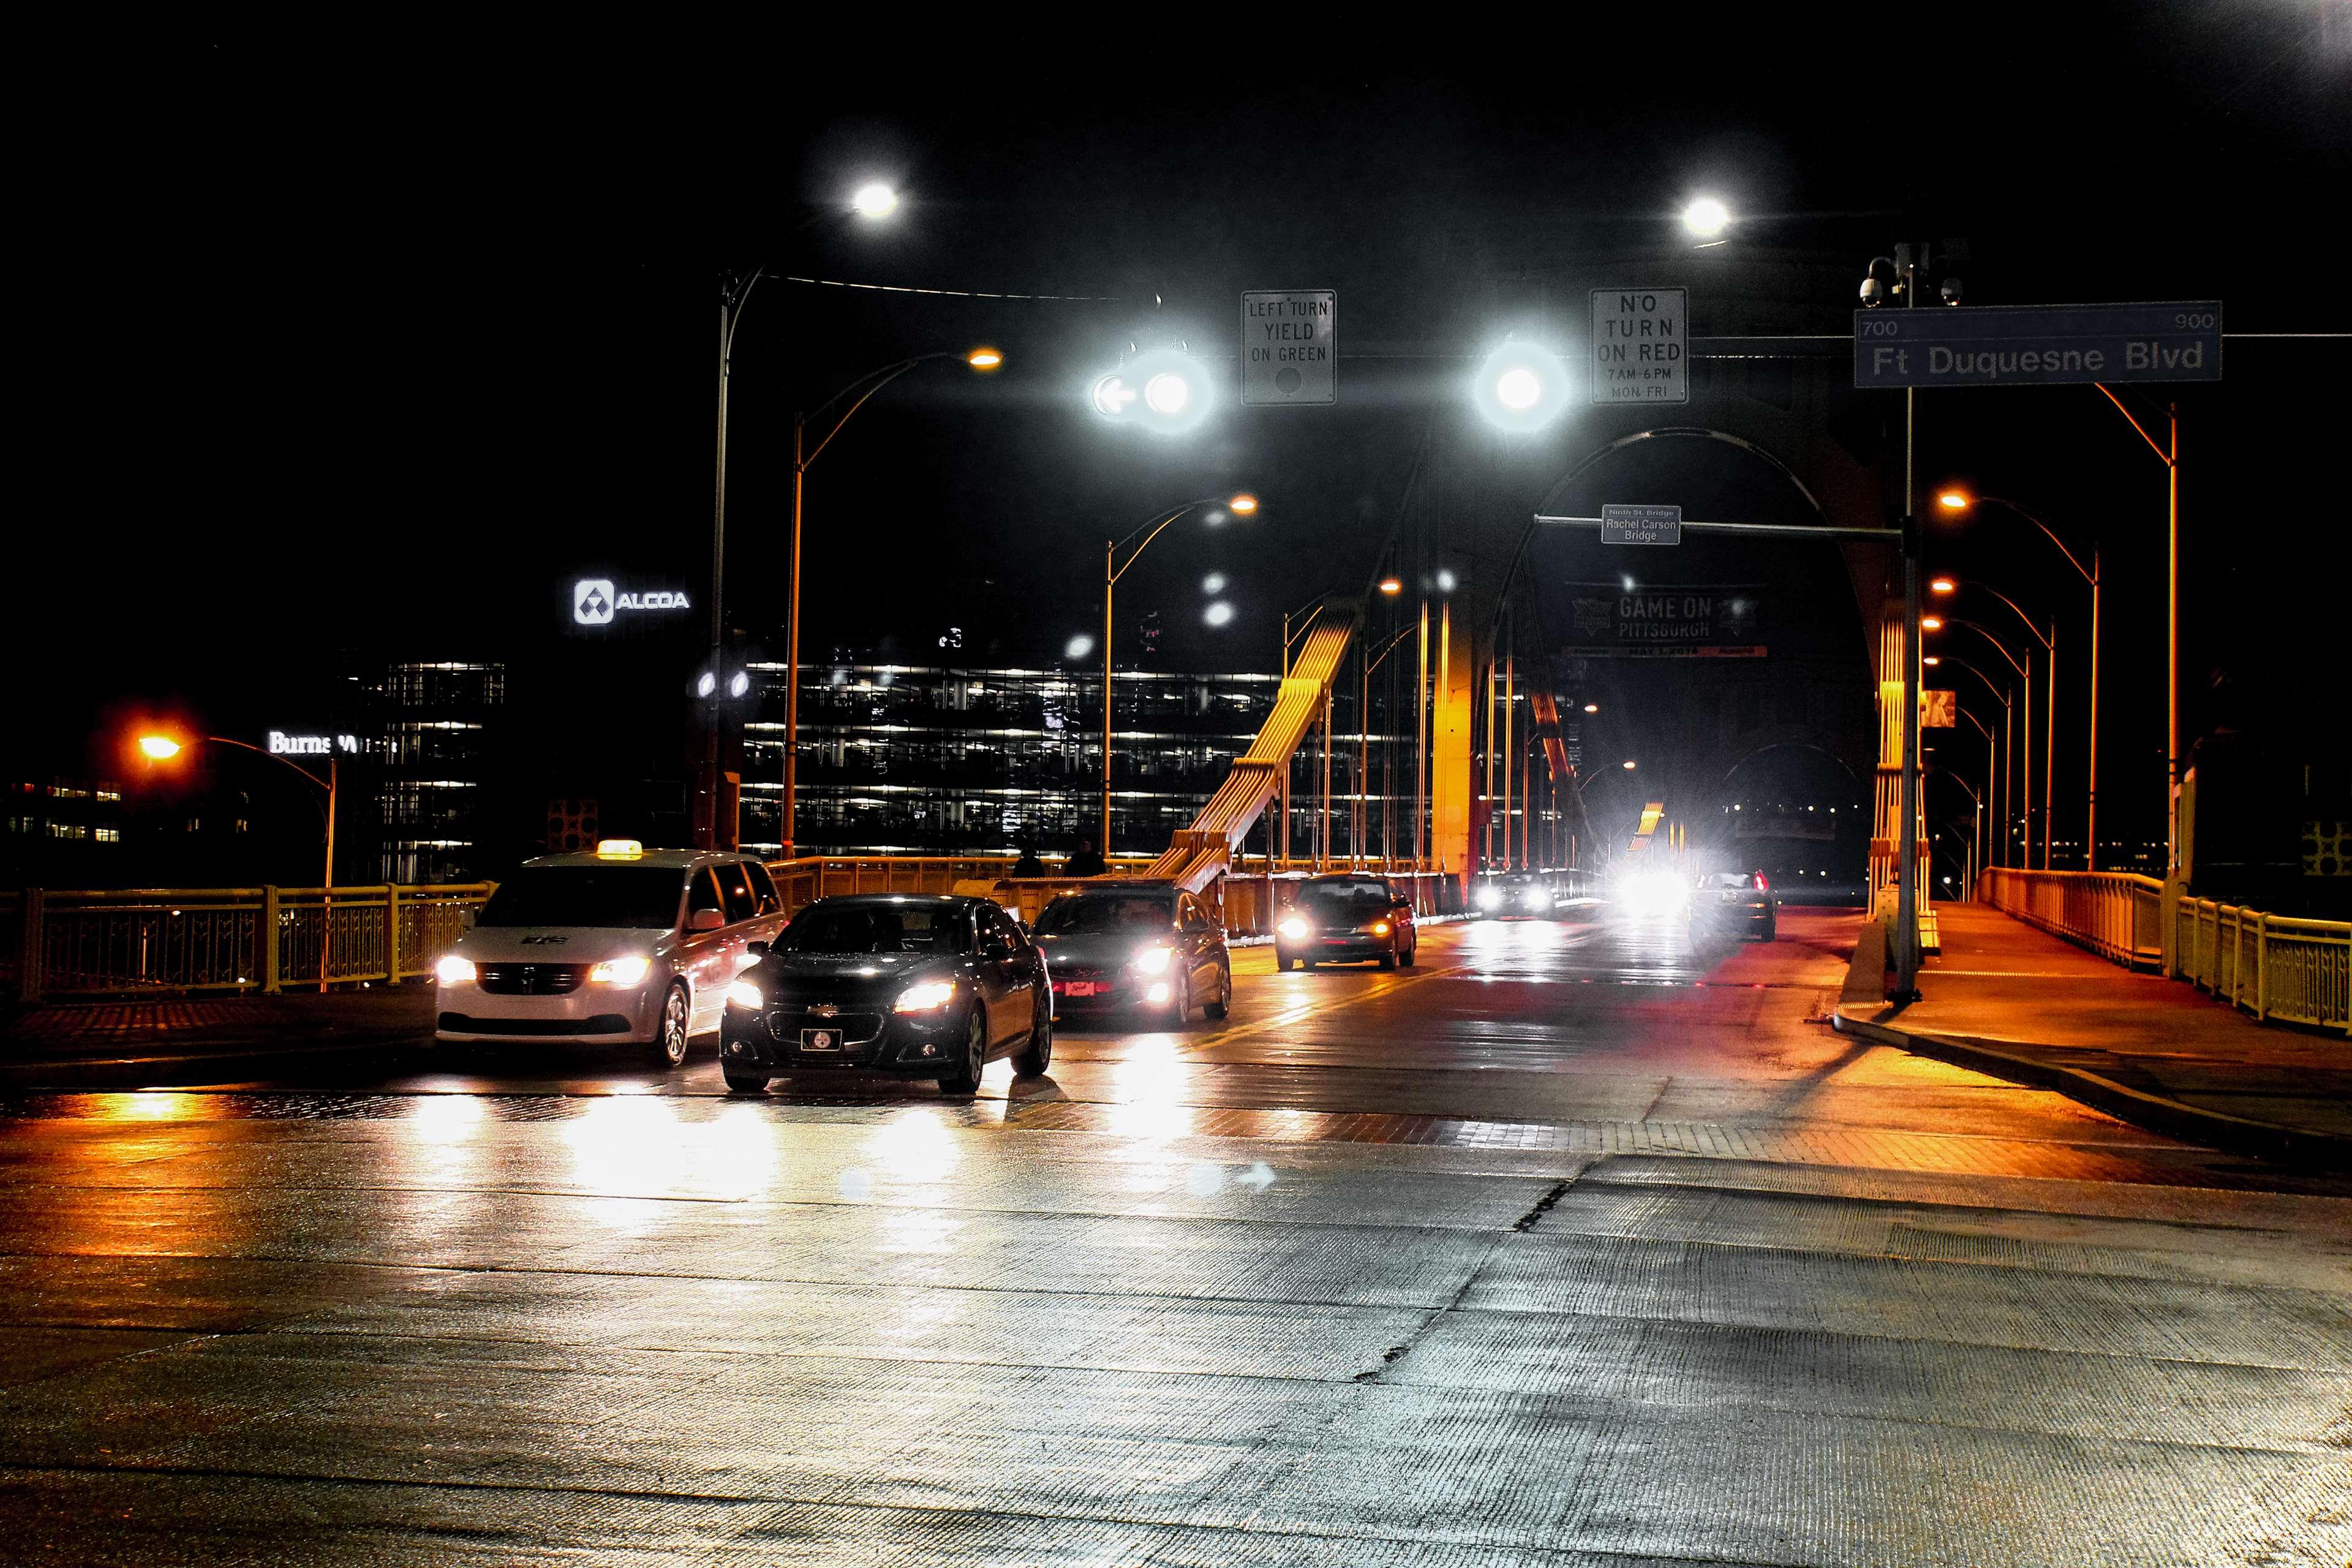 3049362-bridge_cars_city_dark_night_night-lights_road_street